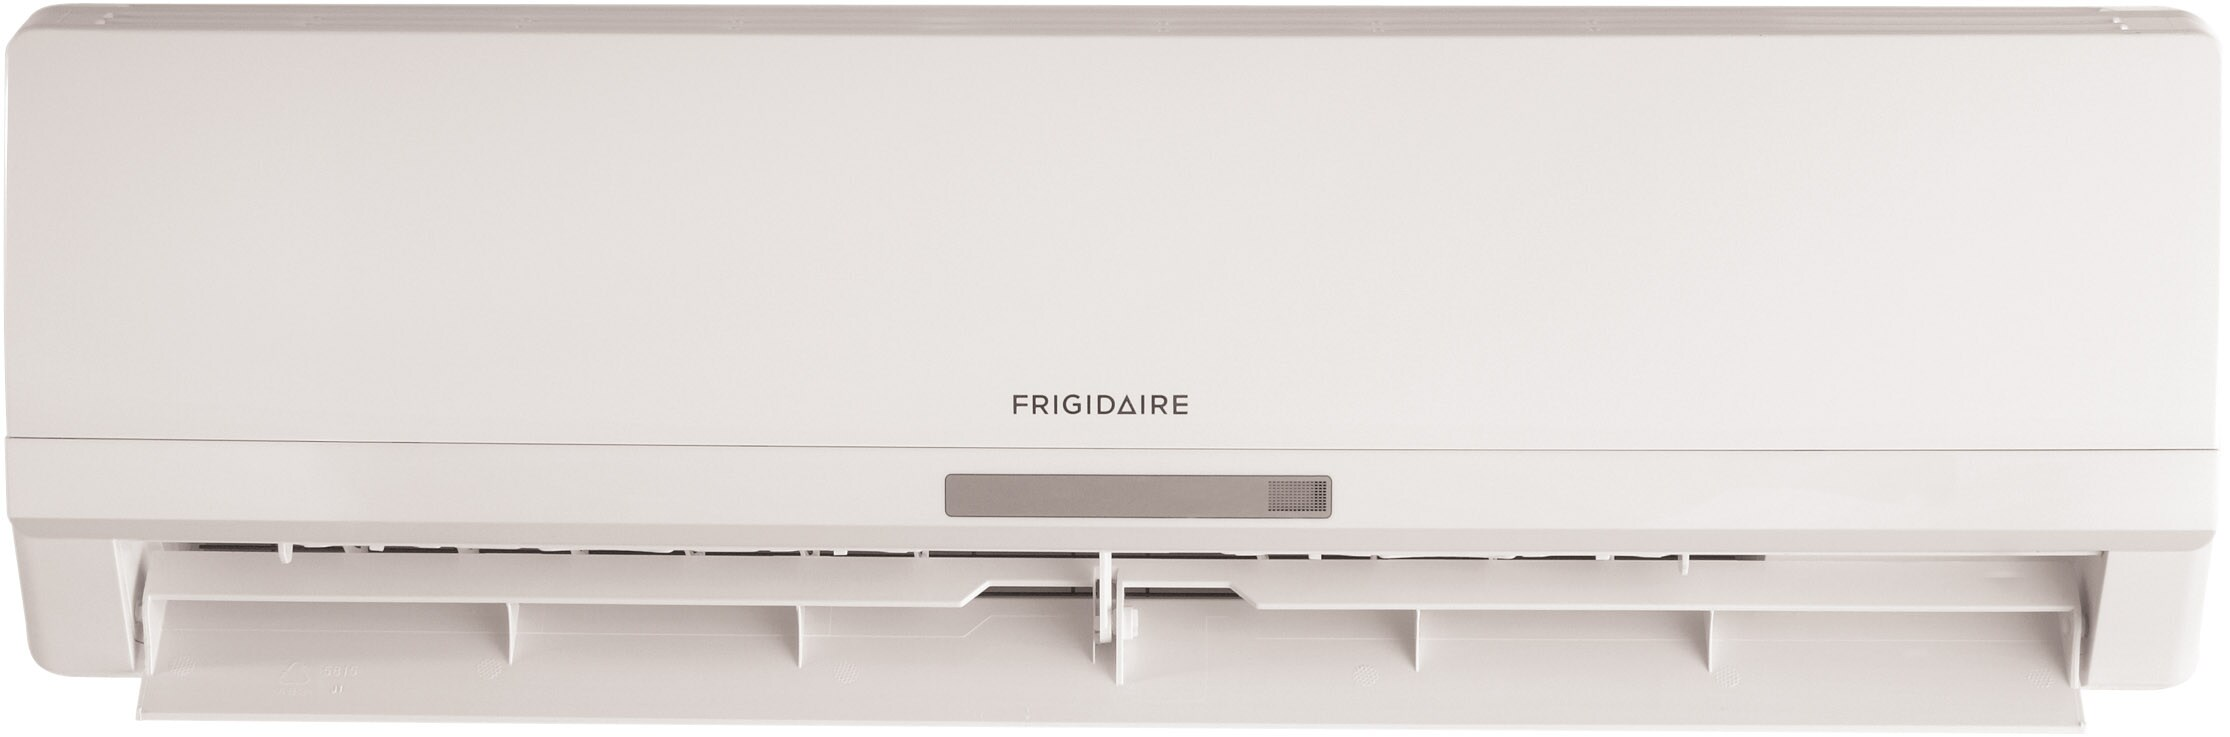 Ductless Split Air Conditioner with Heat Pump, 33,600 BTU